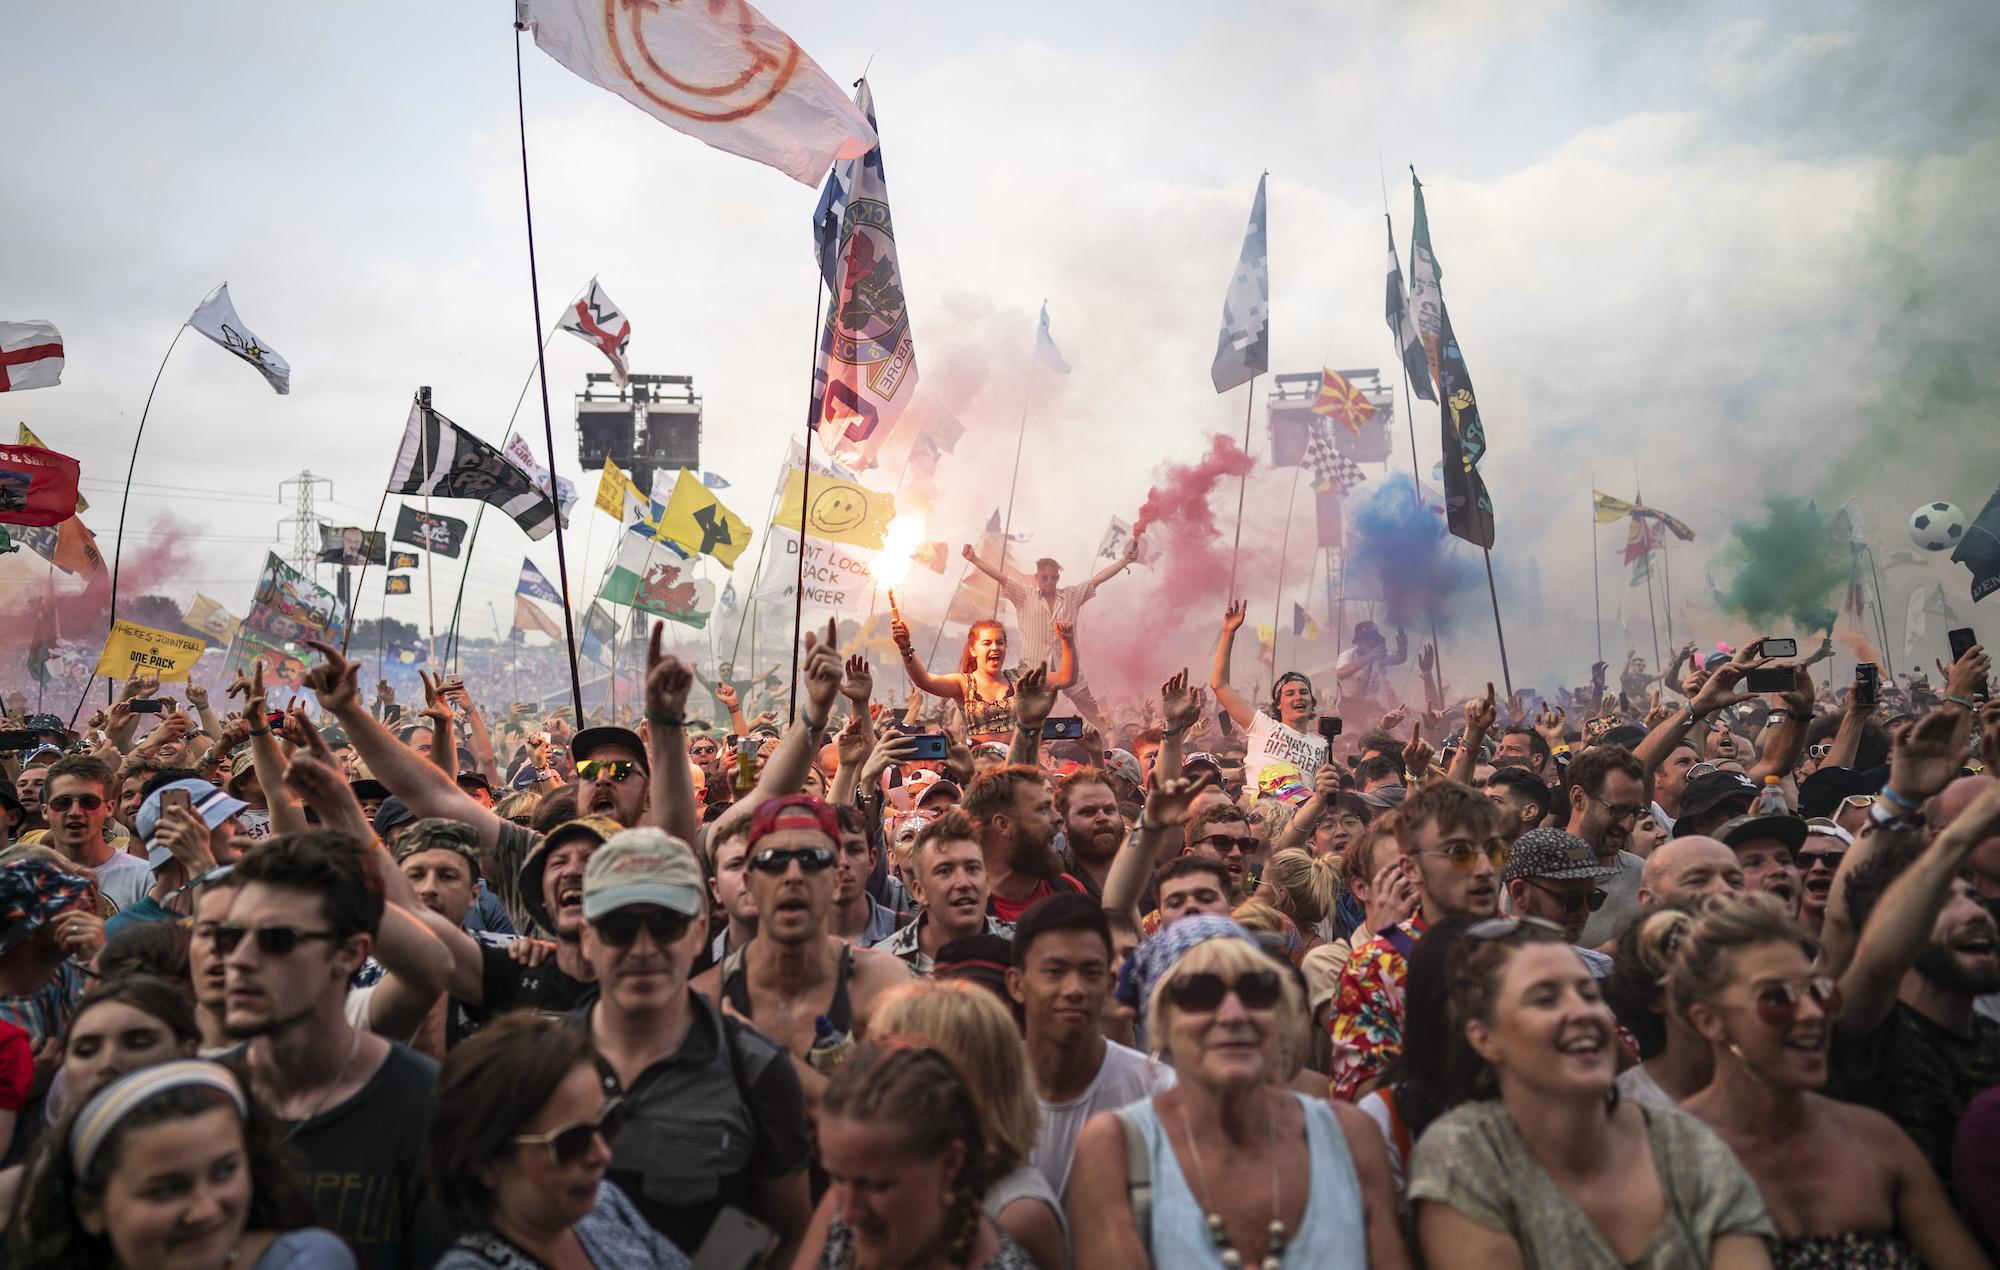 Glastonbury 2019 crowd